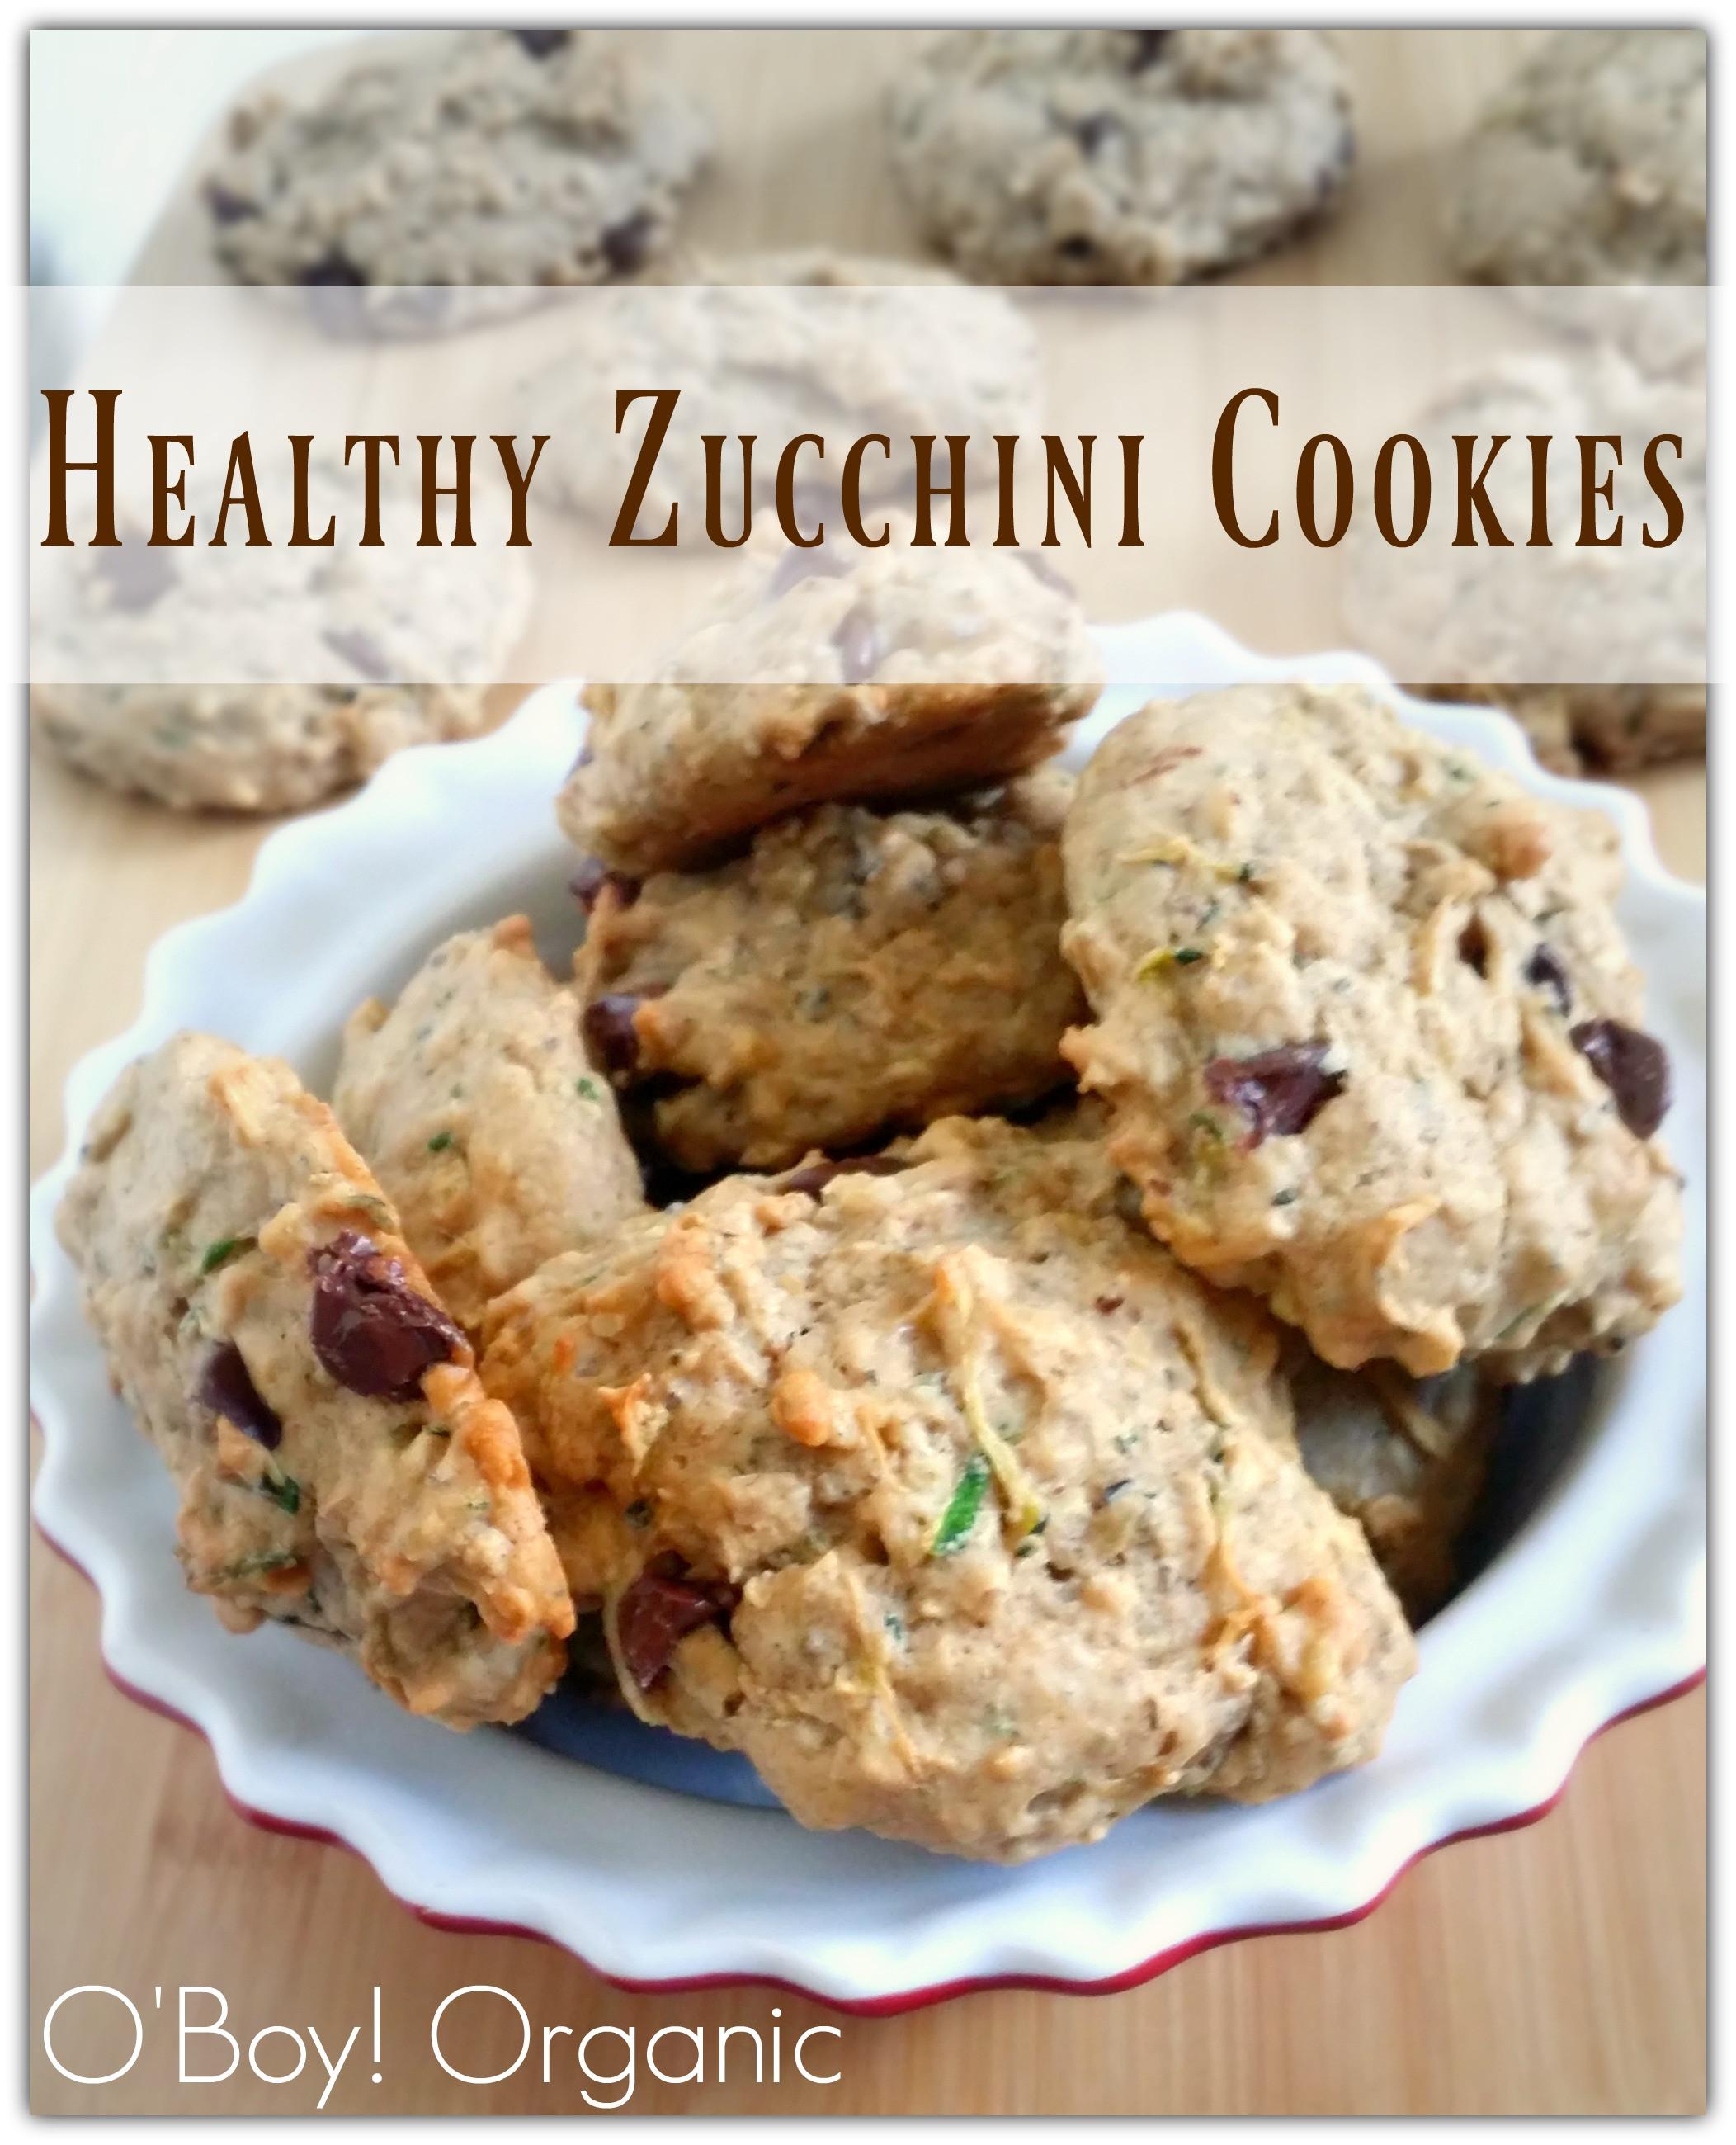 Zucchini Cookies Healthy  Healthy Zucchini Cookies